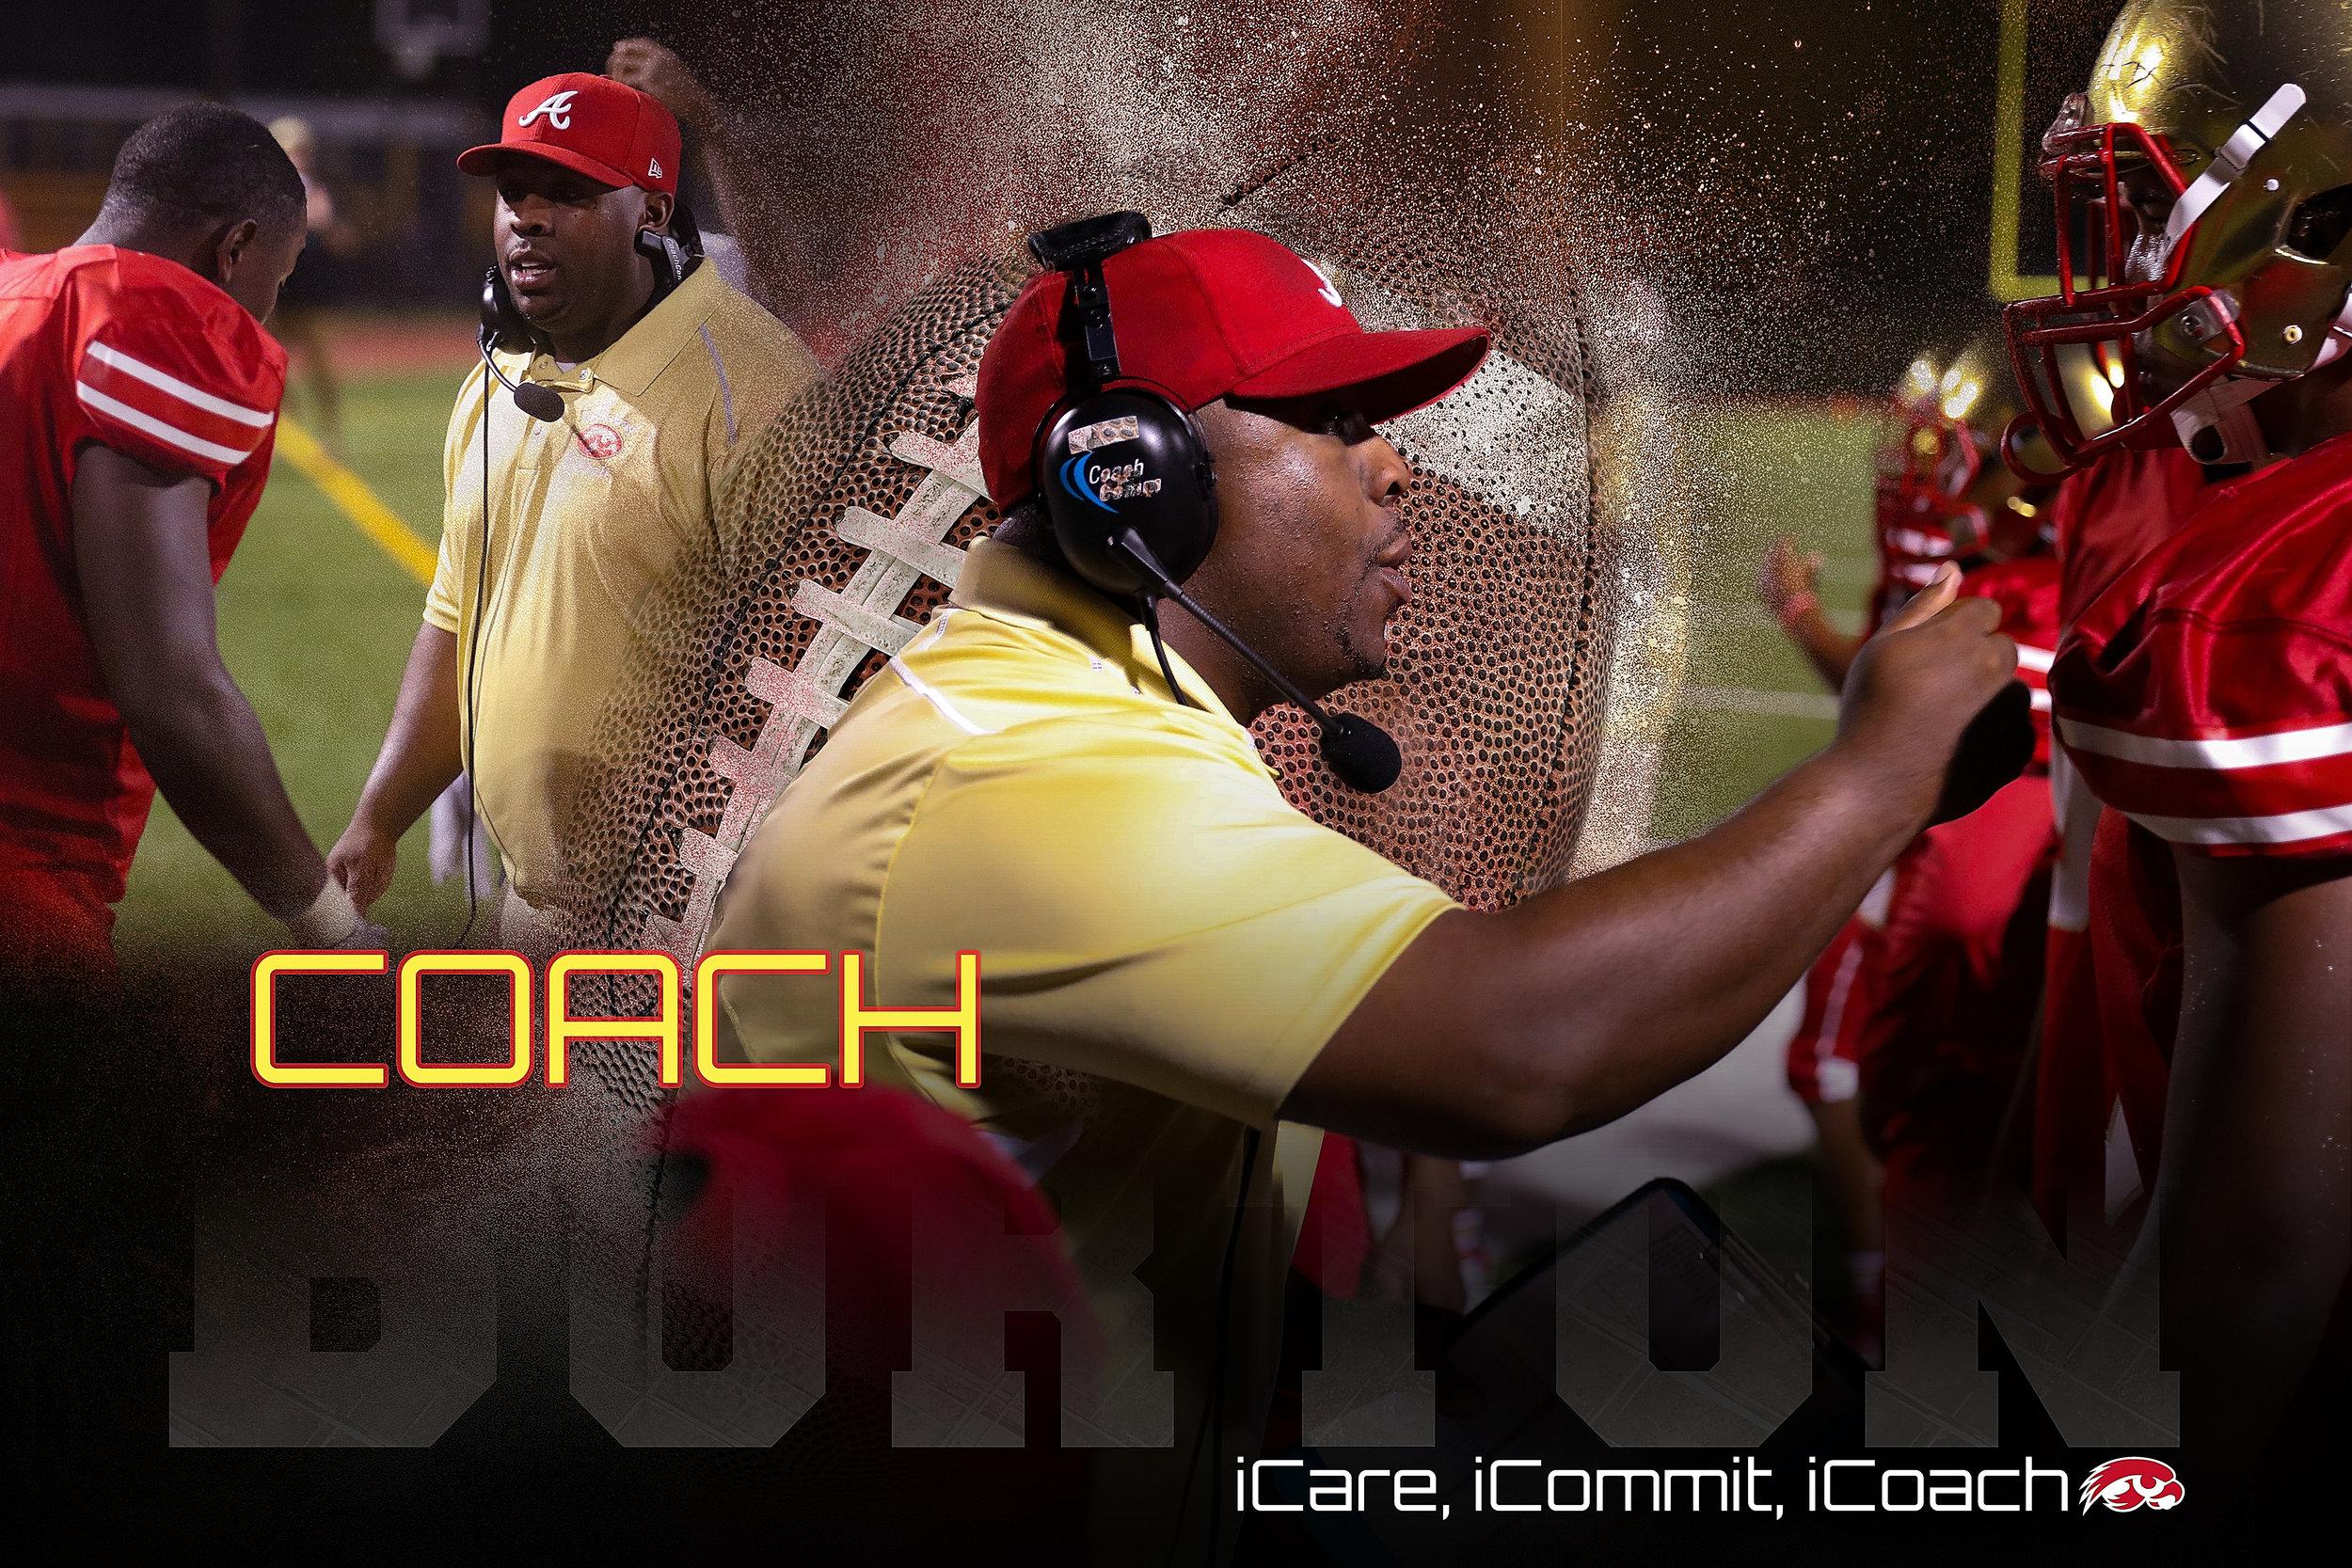 Coach Burton Poster (20x30).jpg